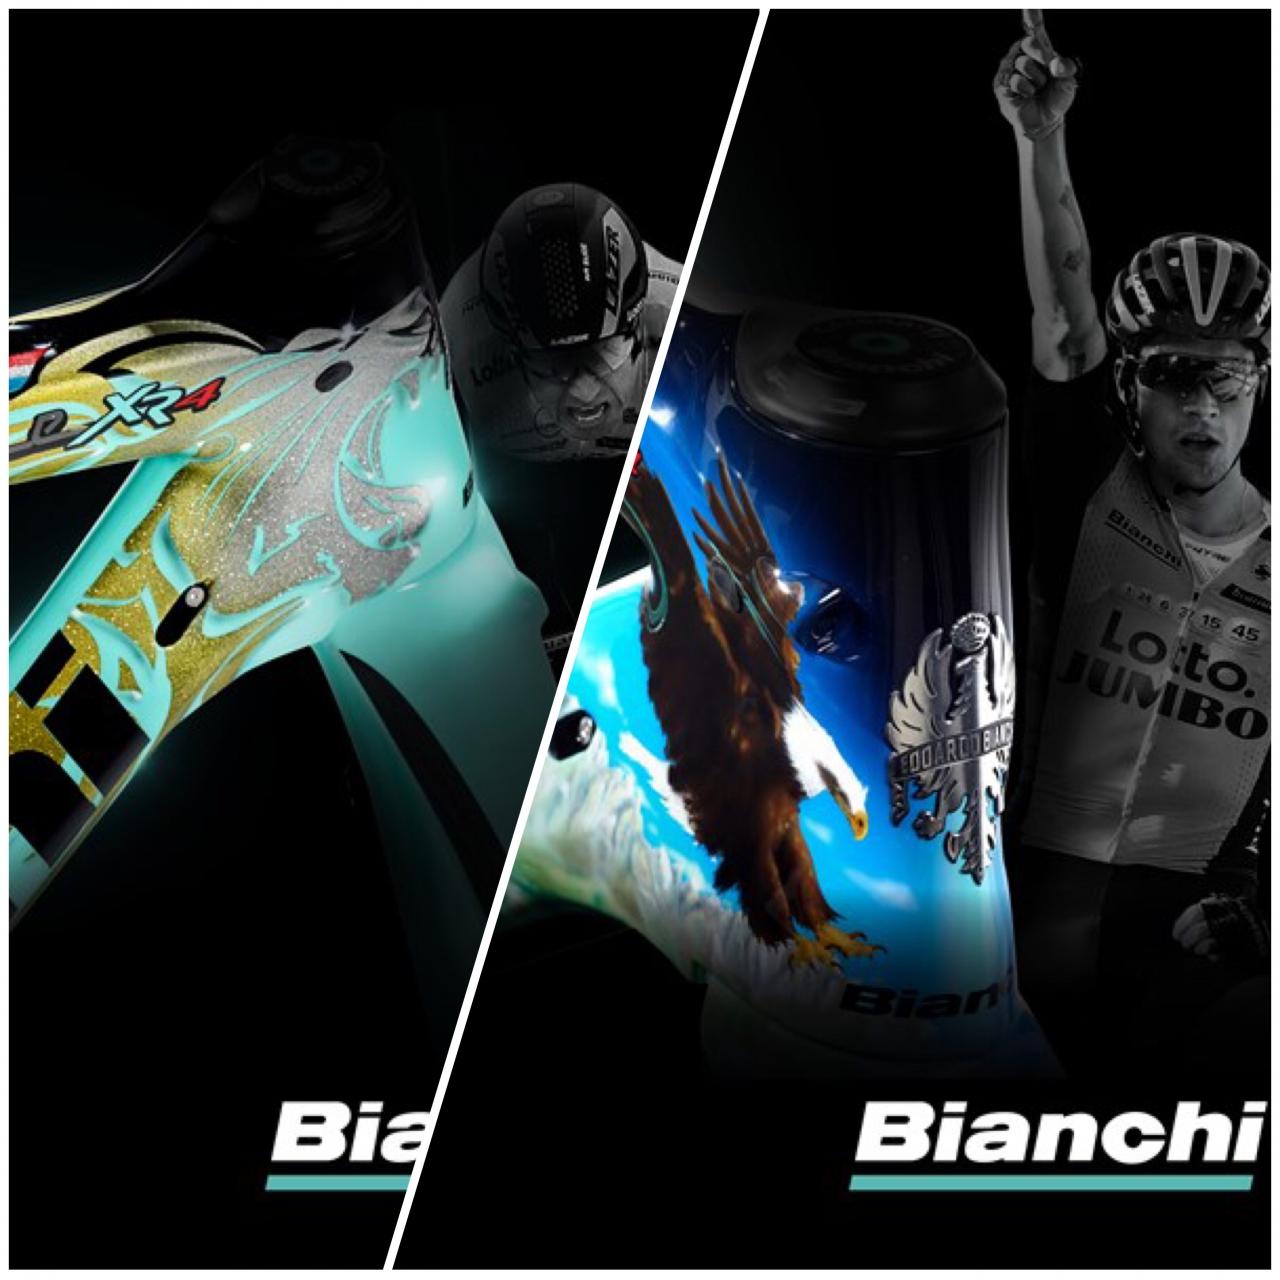 Bianchi Oltre XR4 限定スペシャルエディション予約受付中!